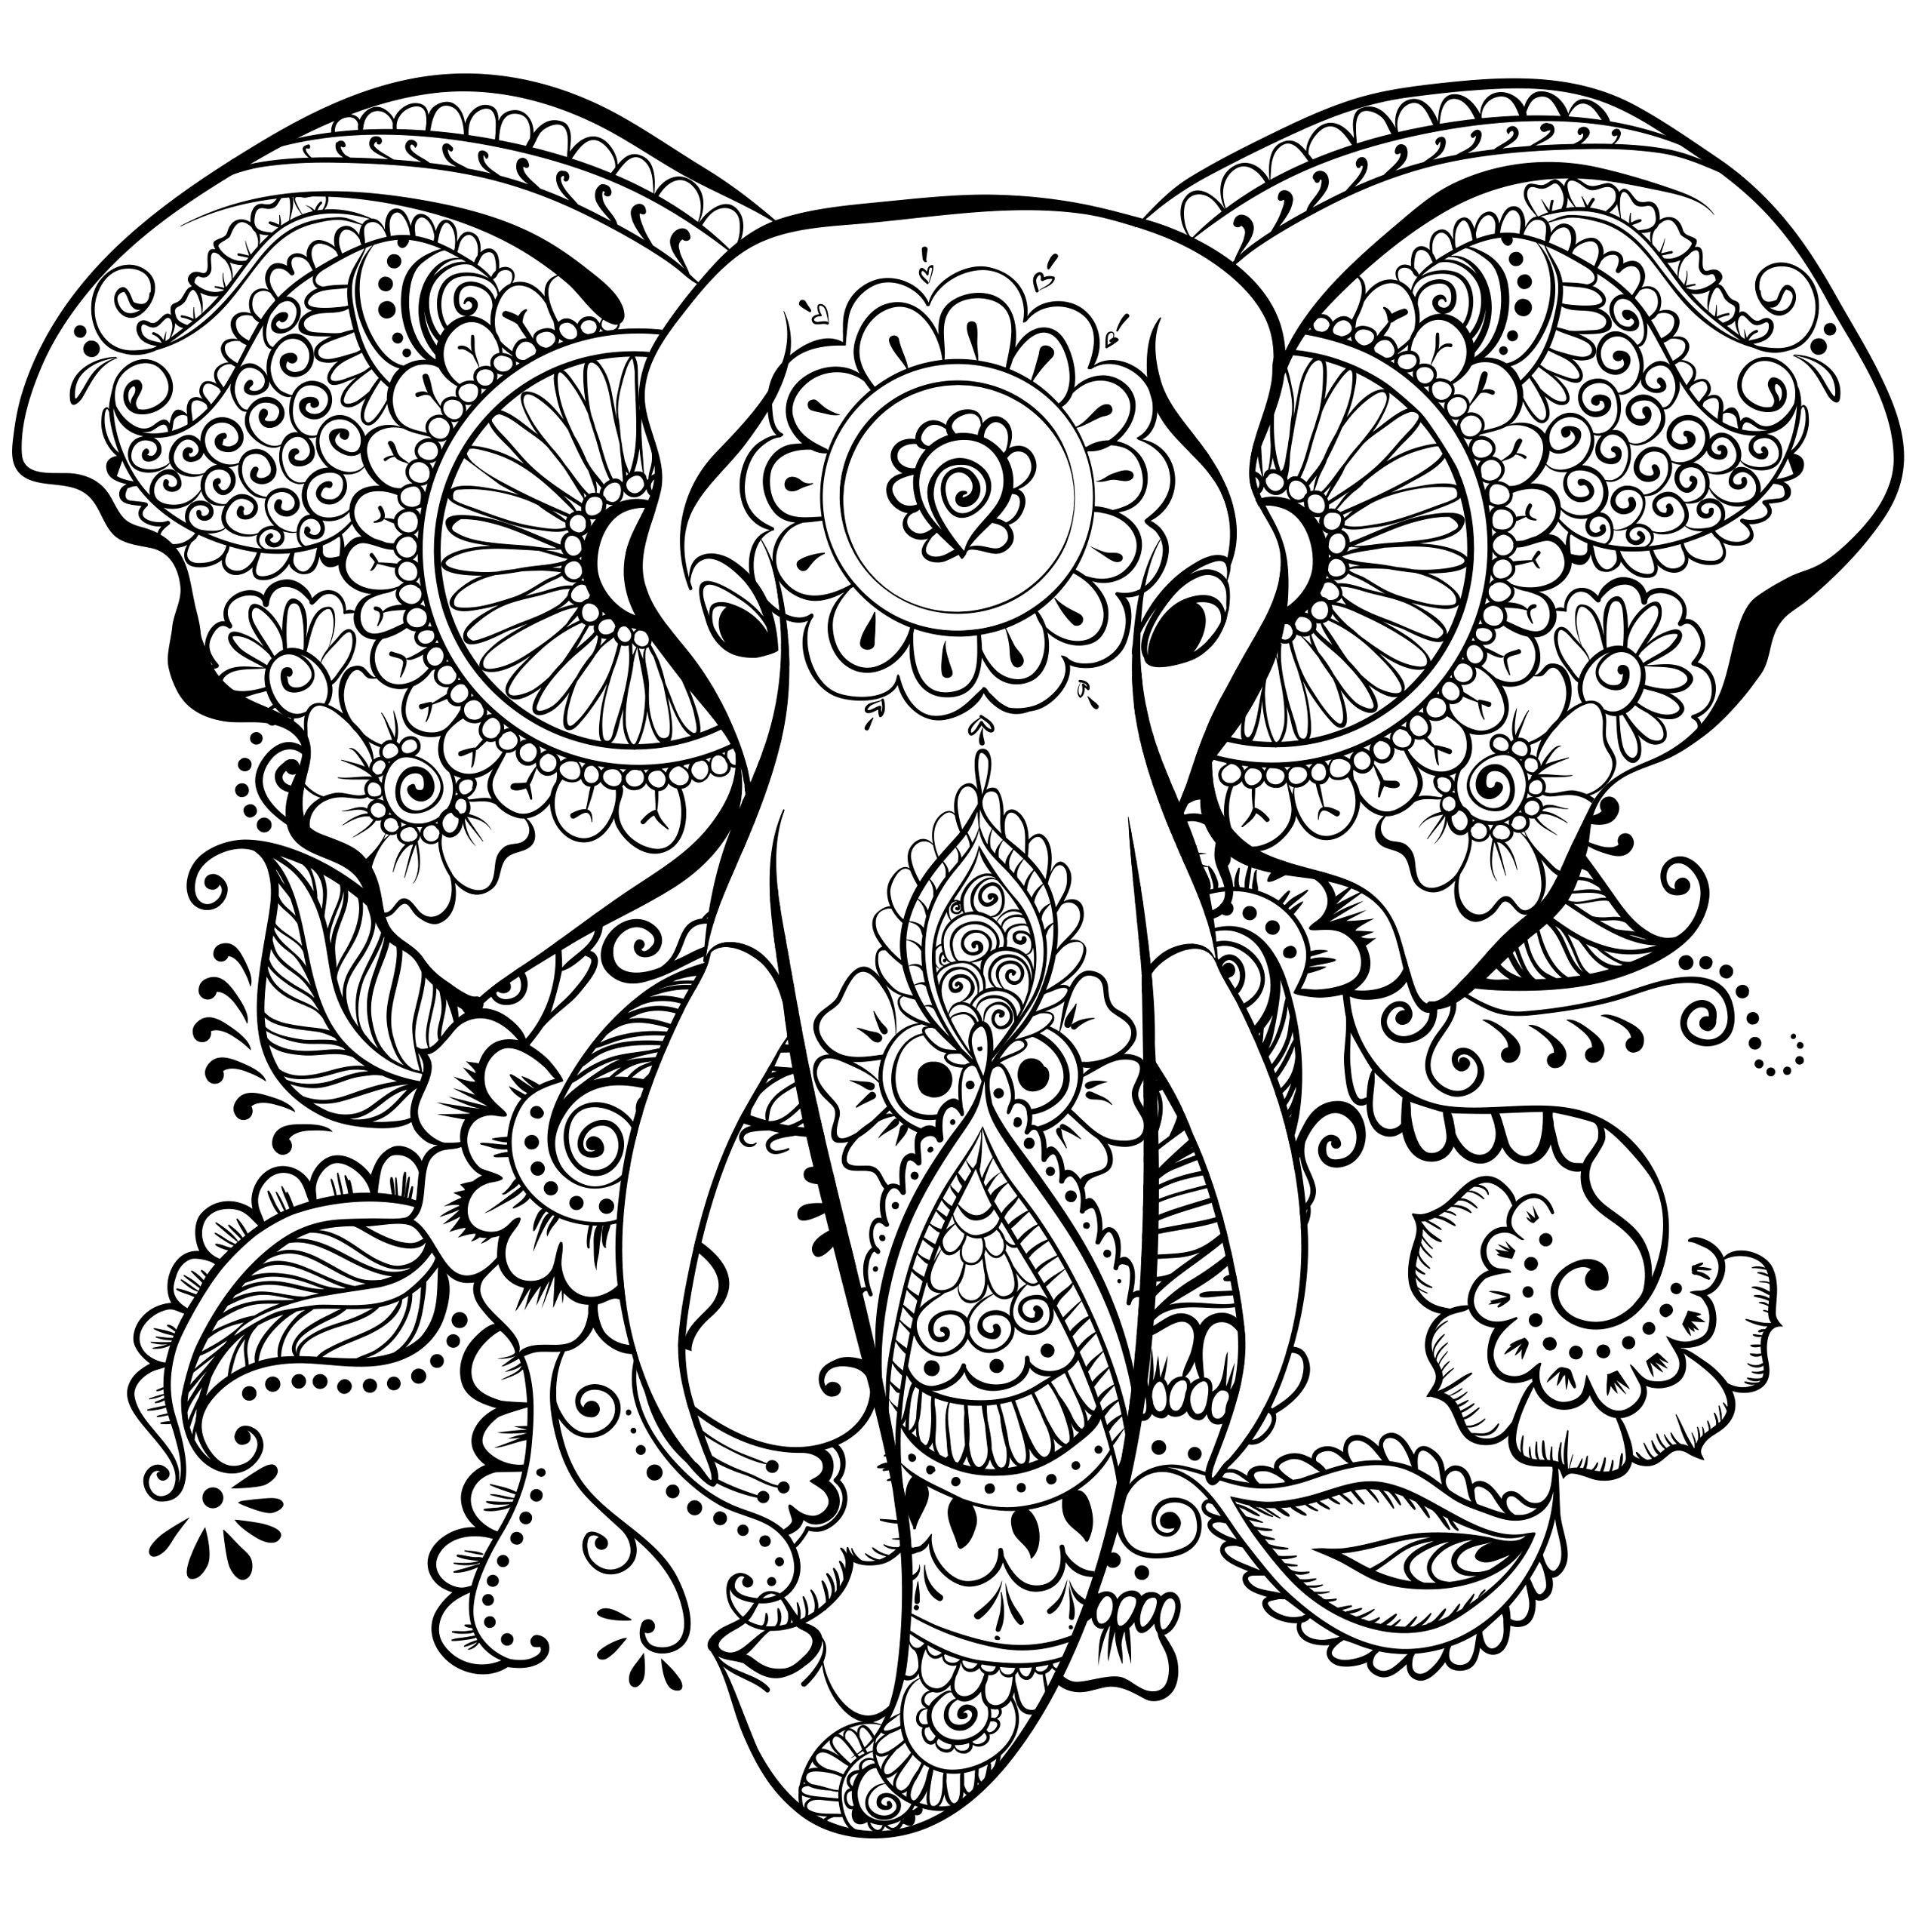 Coloring Pages : Free Printable Easy Mandala Coloring Pages With - Mandala Coloring Free Printable